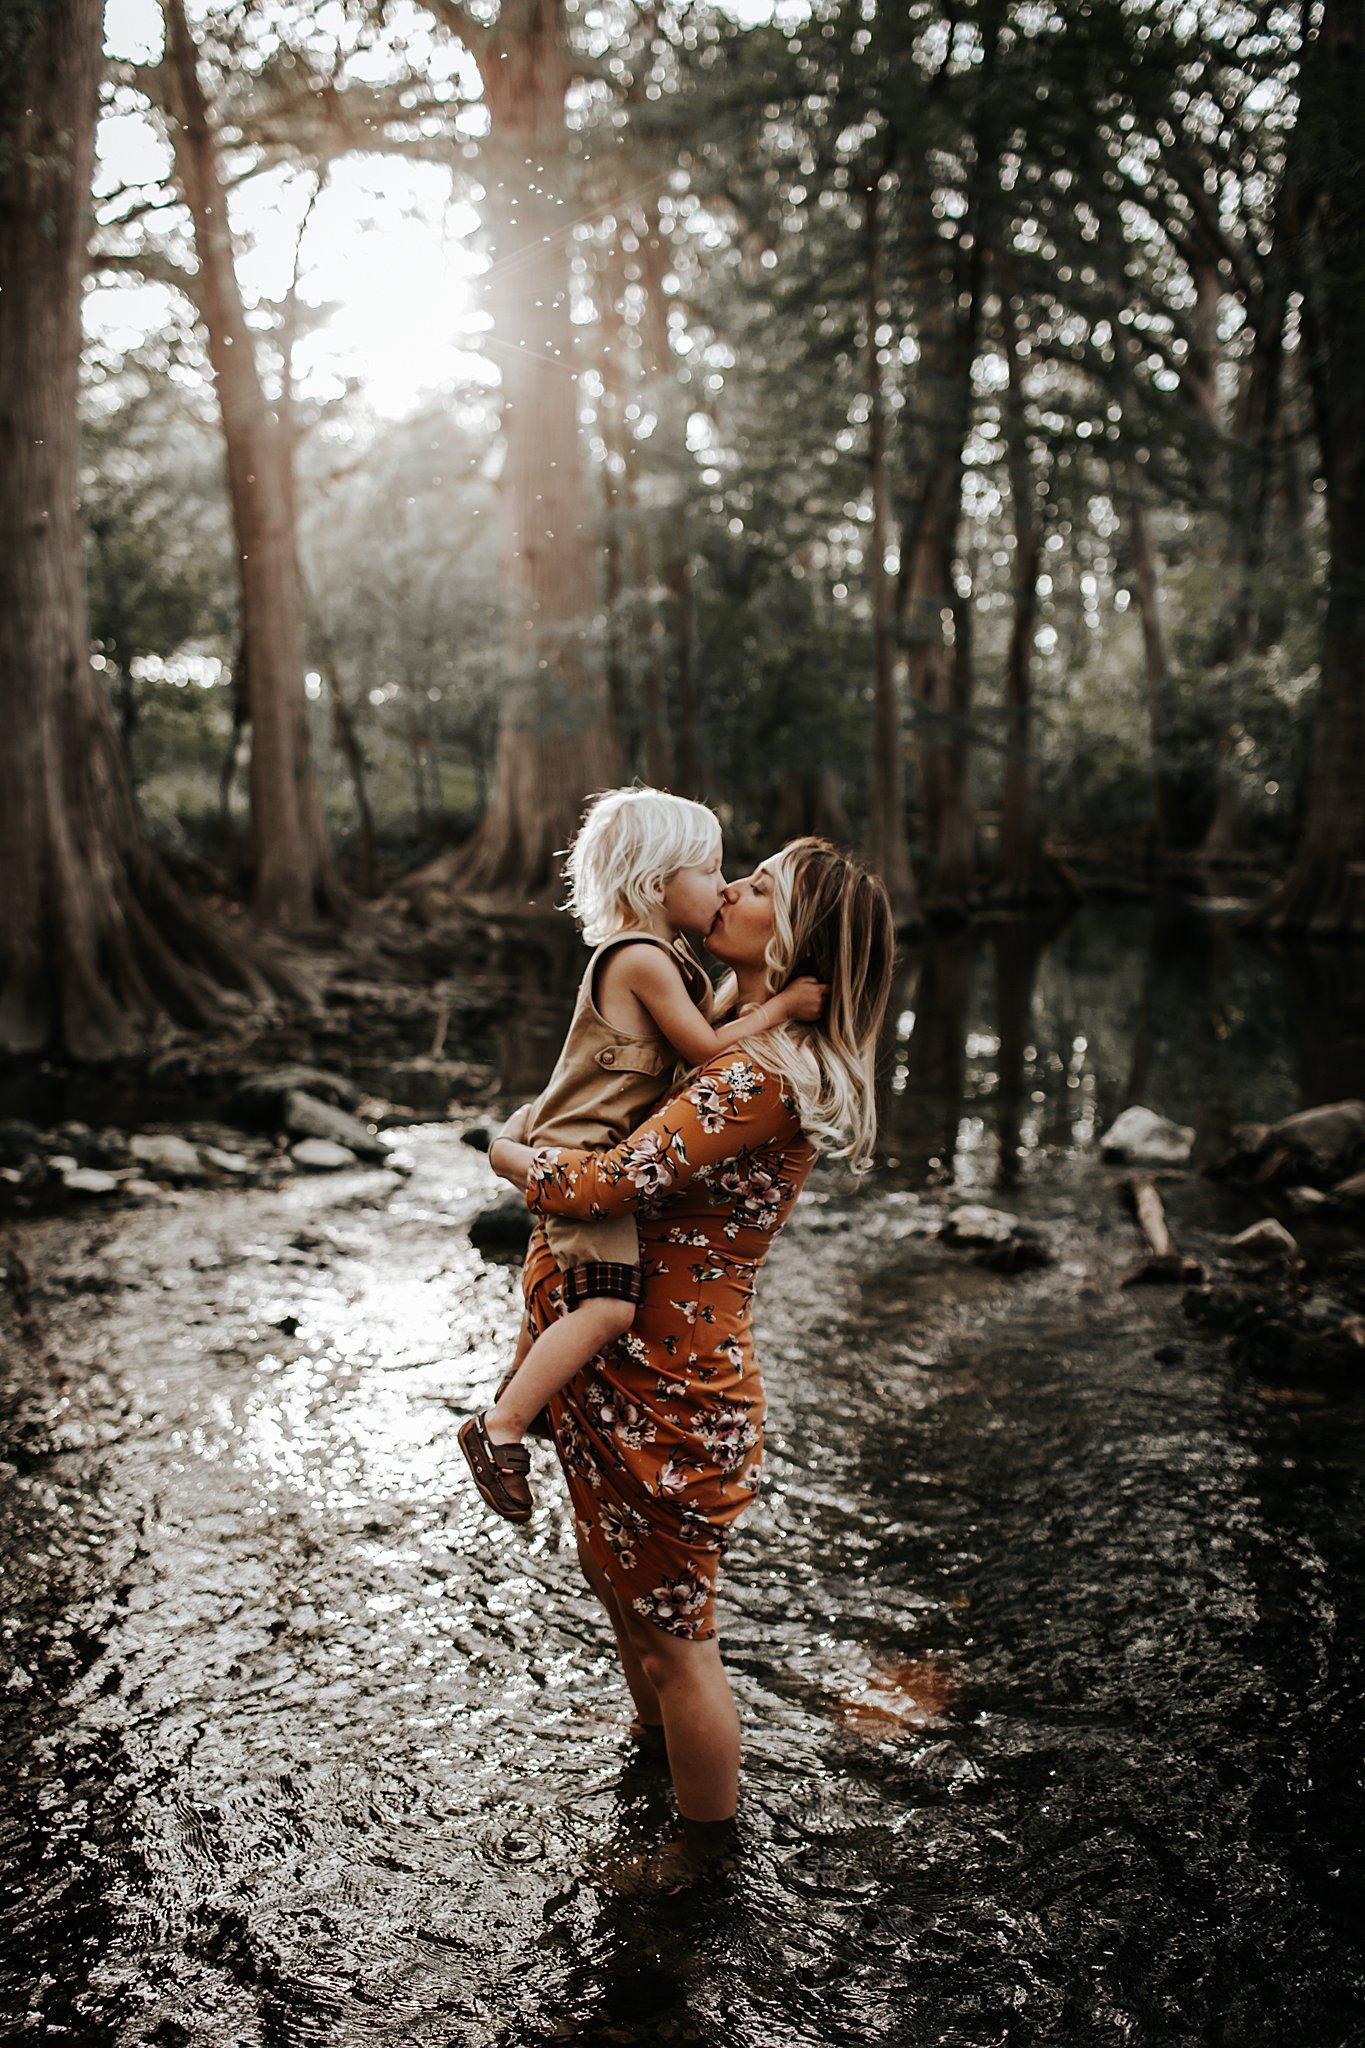 Shannon-San-Antonio-Maternity-Photographer-5_WEB.jpg